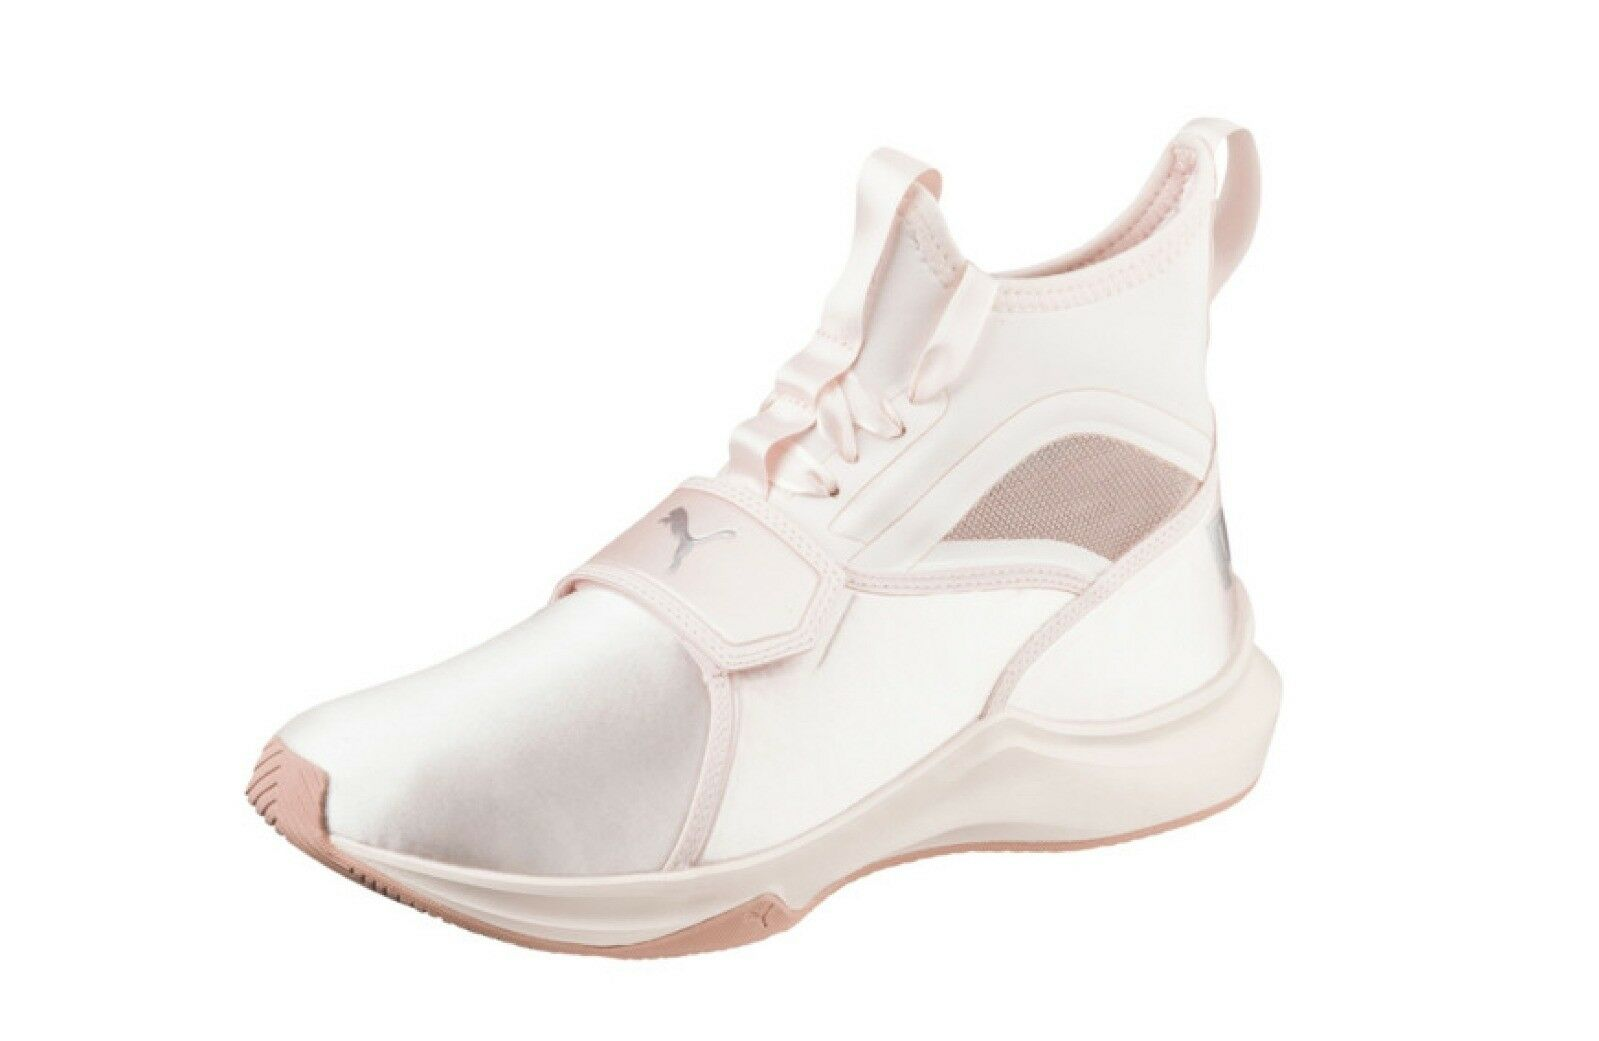 Puma Phenom Satin Satin Satin Ep Femmes Baskets Montante Chaussures UK Taille 5 Perle 830f97